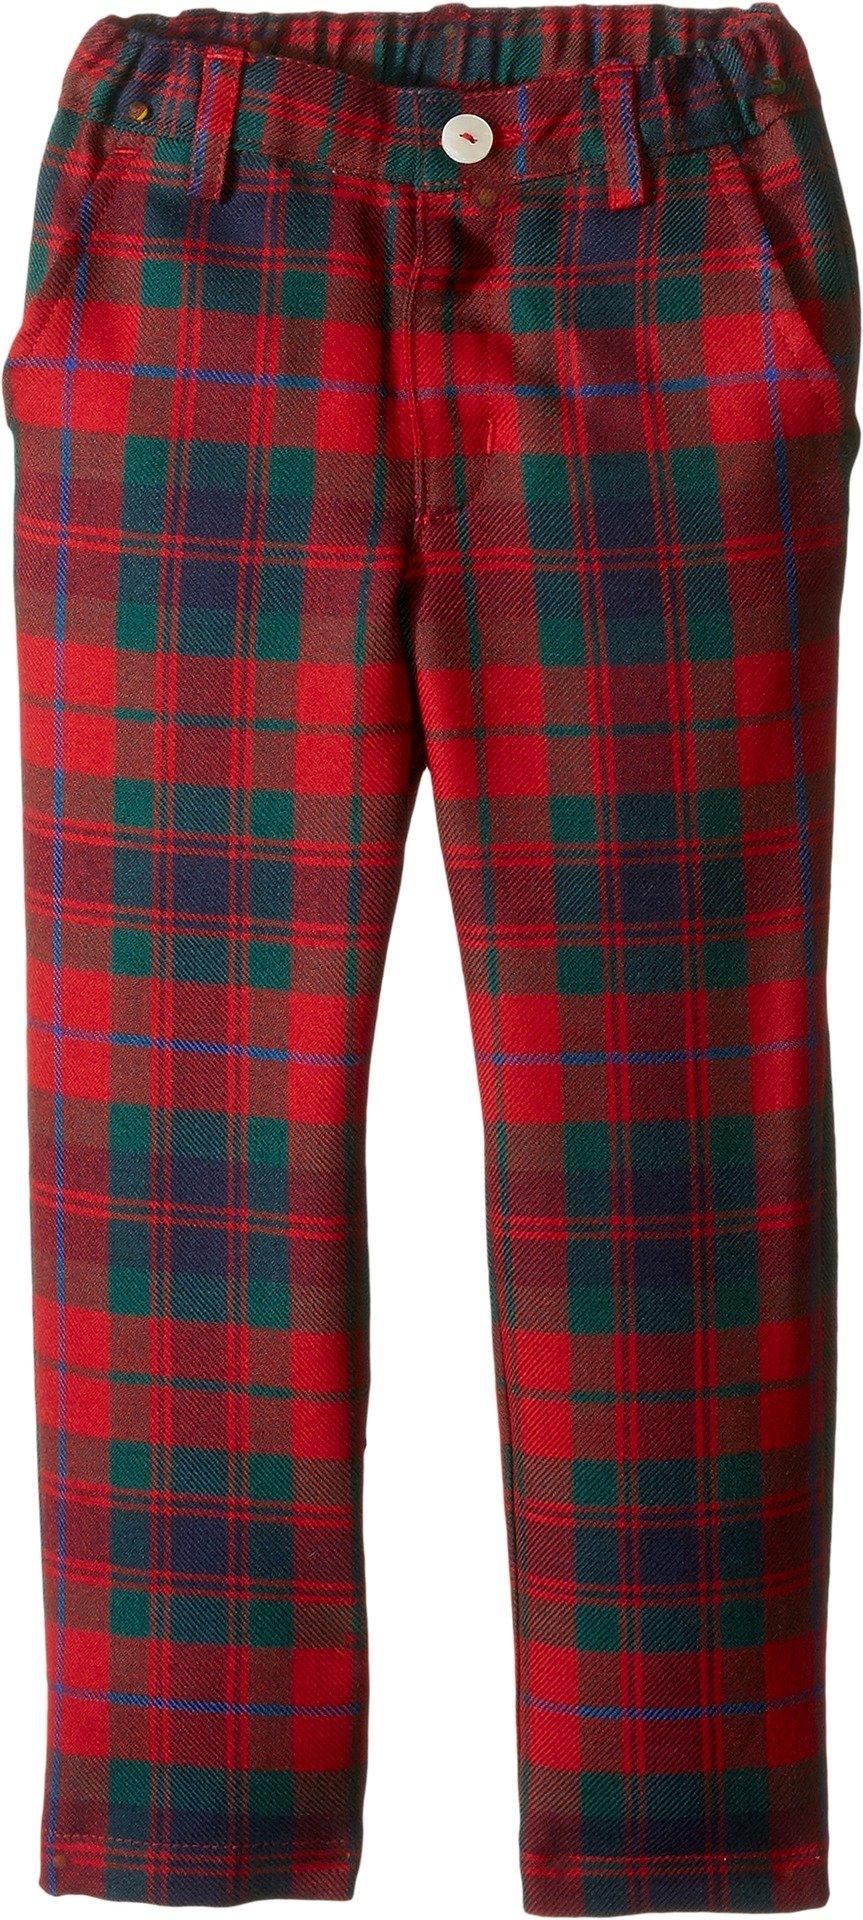 OSCAR DE LA RENTA Childrenswear Baby Boy's Holiday Plaid Wool Classic Slim Pants (Toddler/Little Kids/Big Kids) Ruby Multi Pants